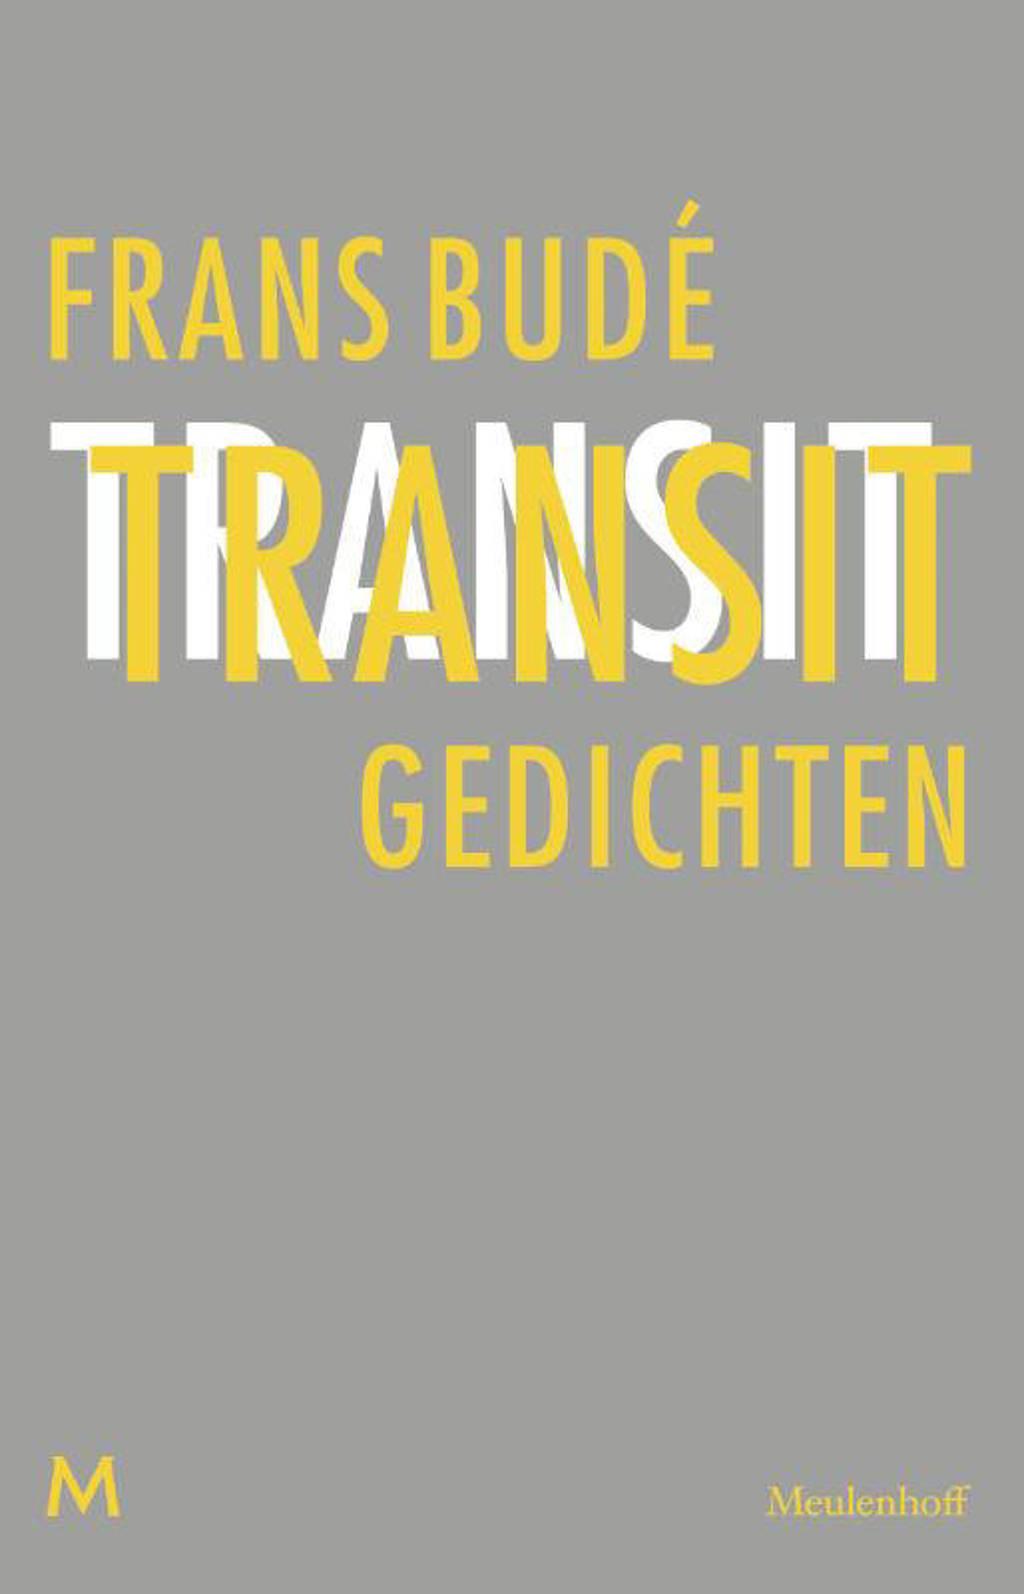 Transit - Frans Budé